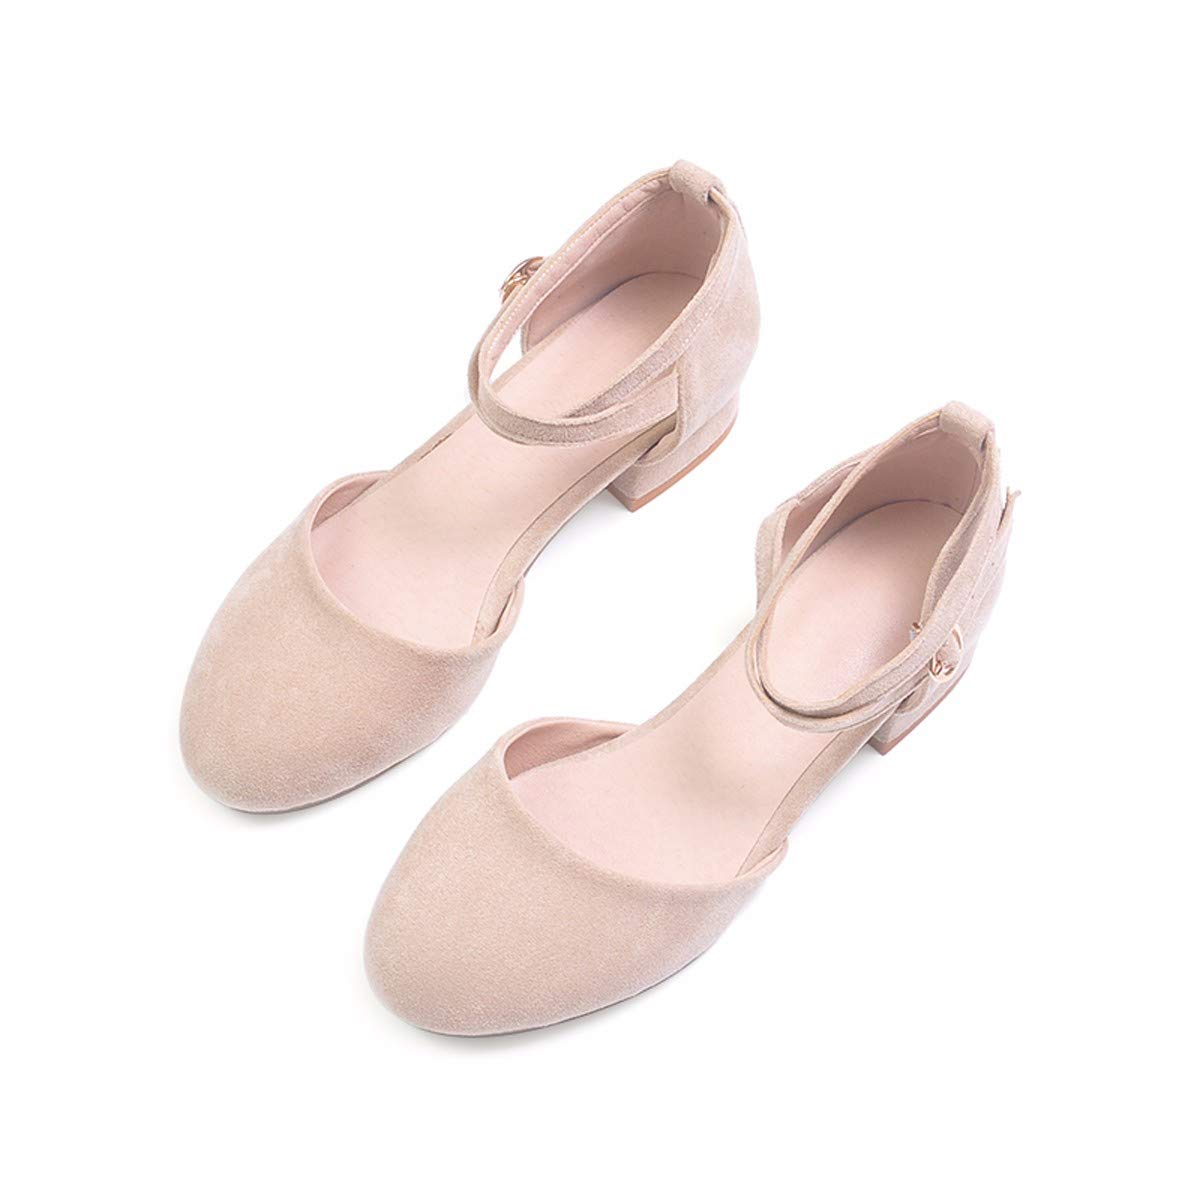 KPHY-Baotou Sandaleen Mädchen Studenten - Joker Flachen Boden Einfache Bindung Mädchen Retro - cm 35 Aprikosen - Farbe